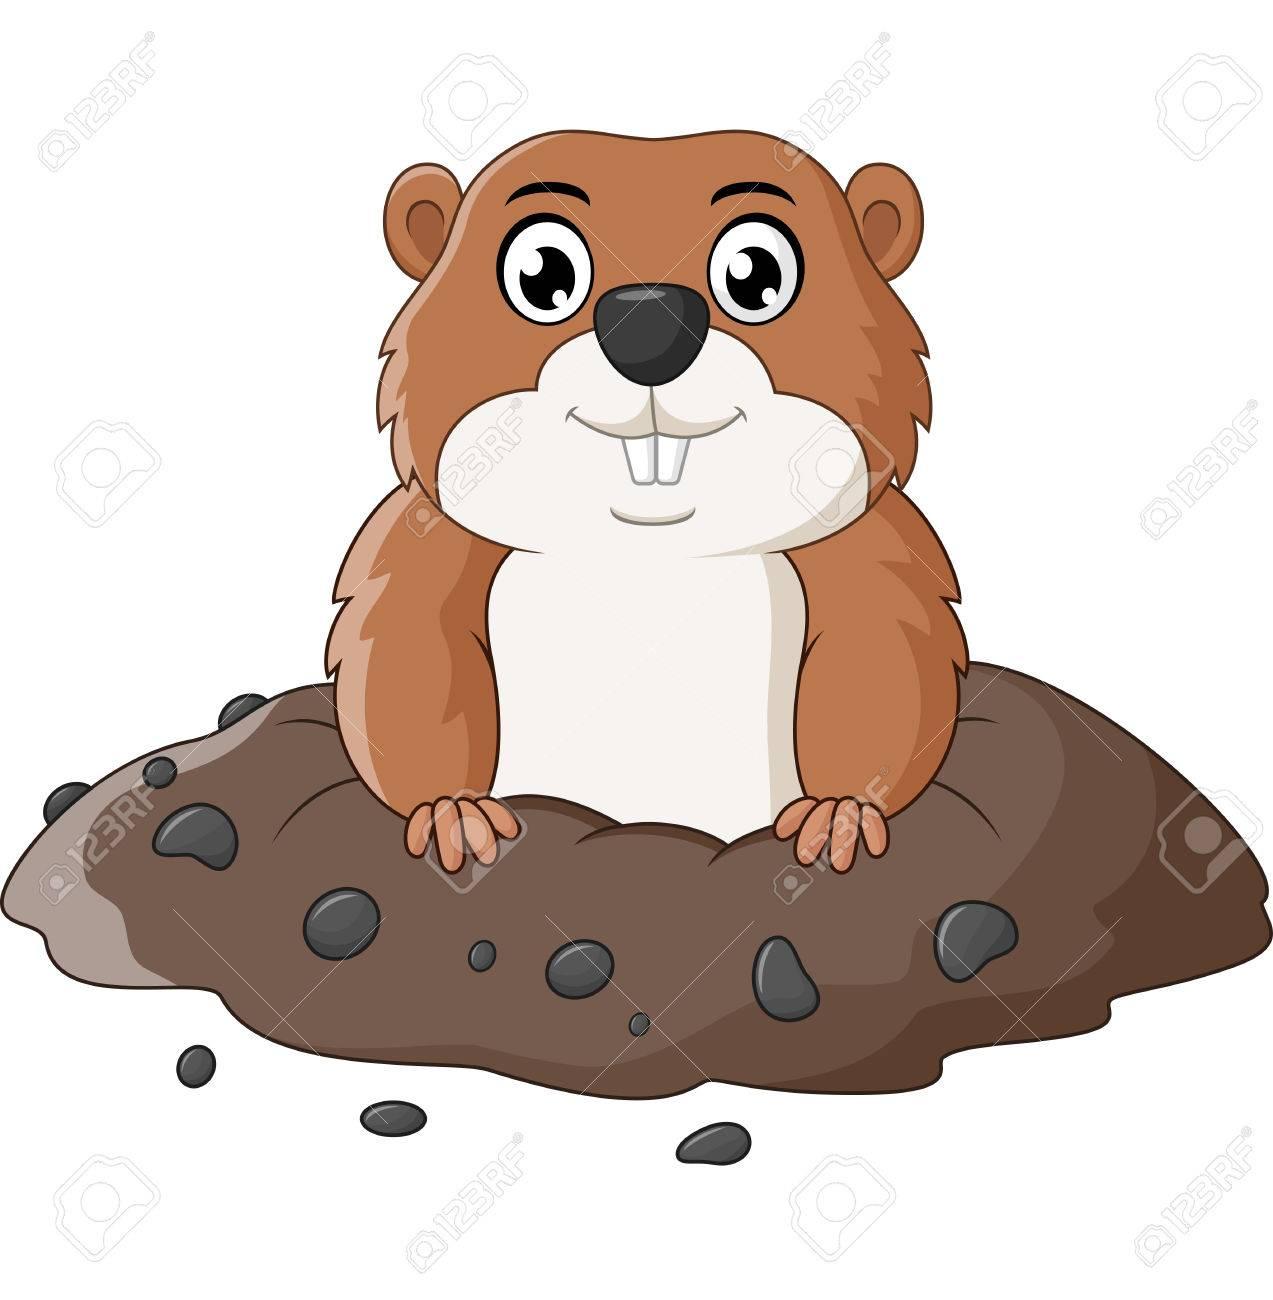 Free download clip art. Groundhog clipart mole